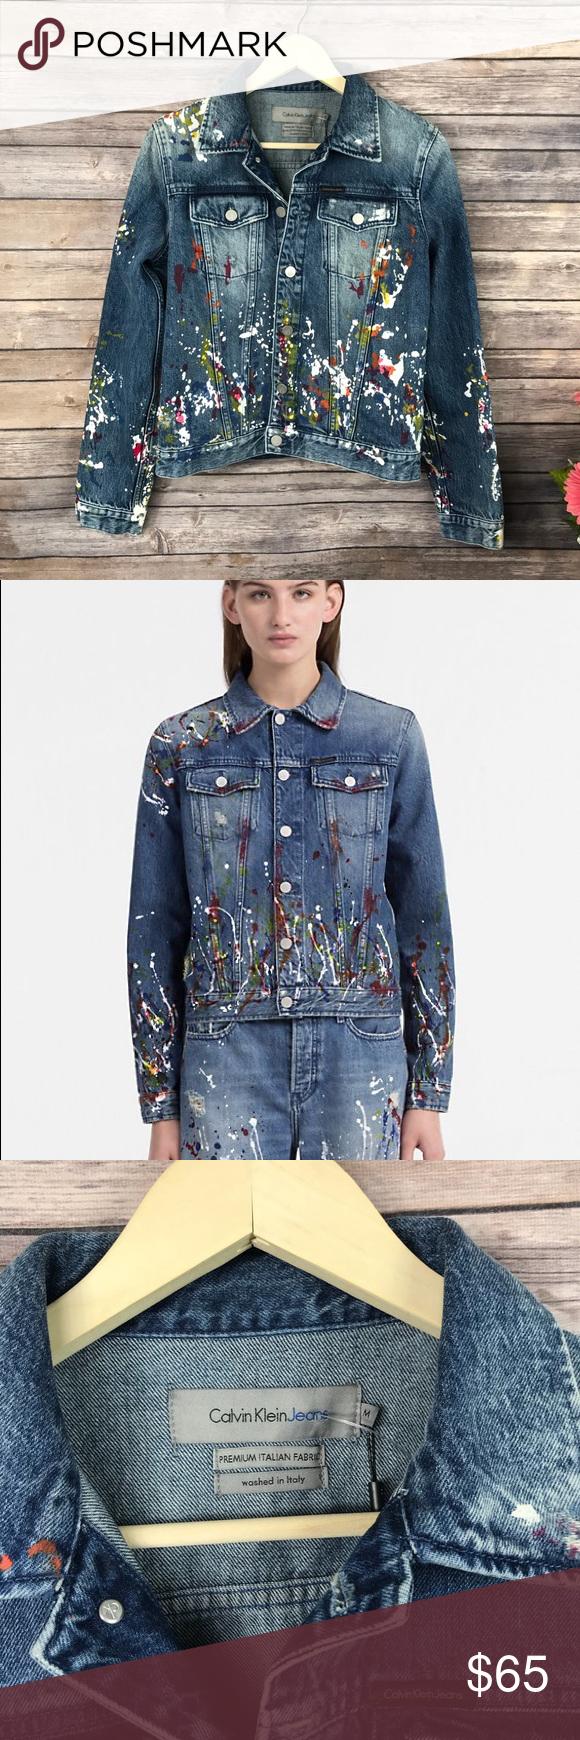 Calvin Klein Paint Splatter Jean Jacket Nwt Clothes Design Jackets Calvin Klein [ 1740 x 580 Pixel ]